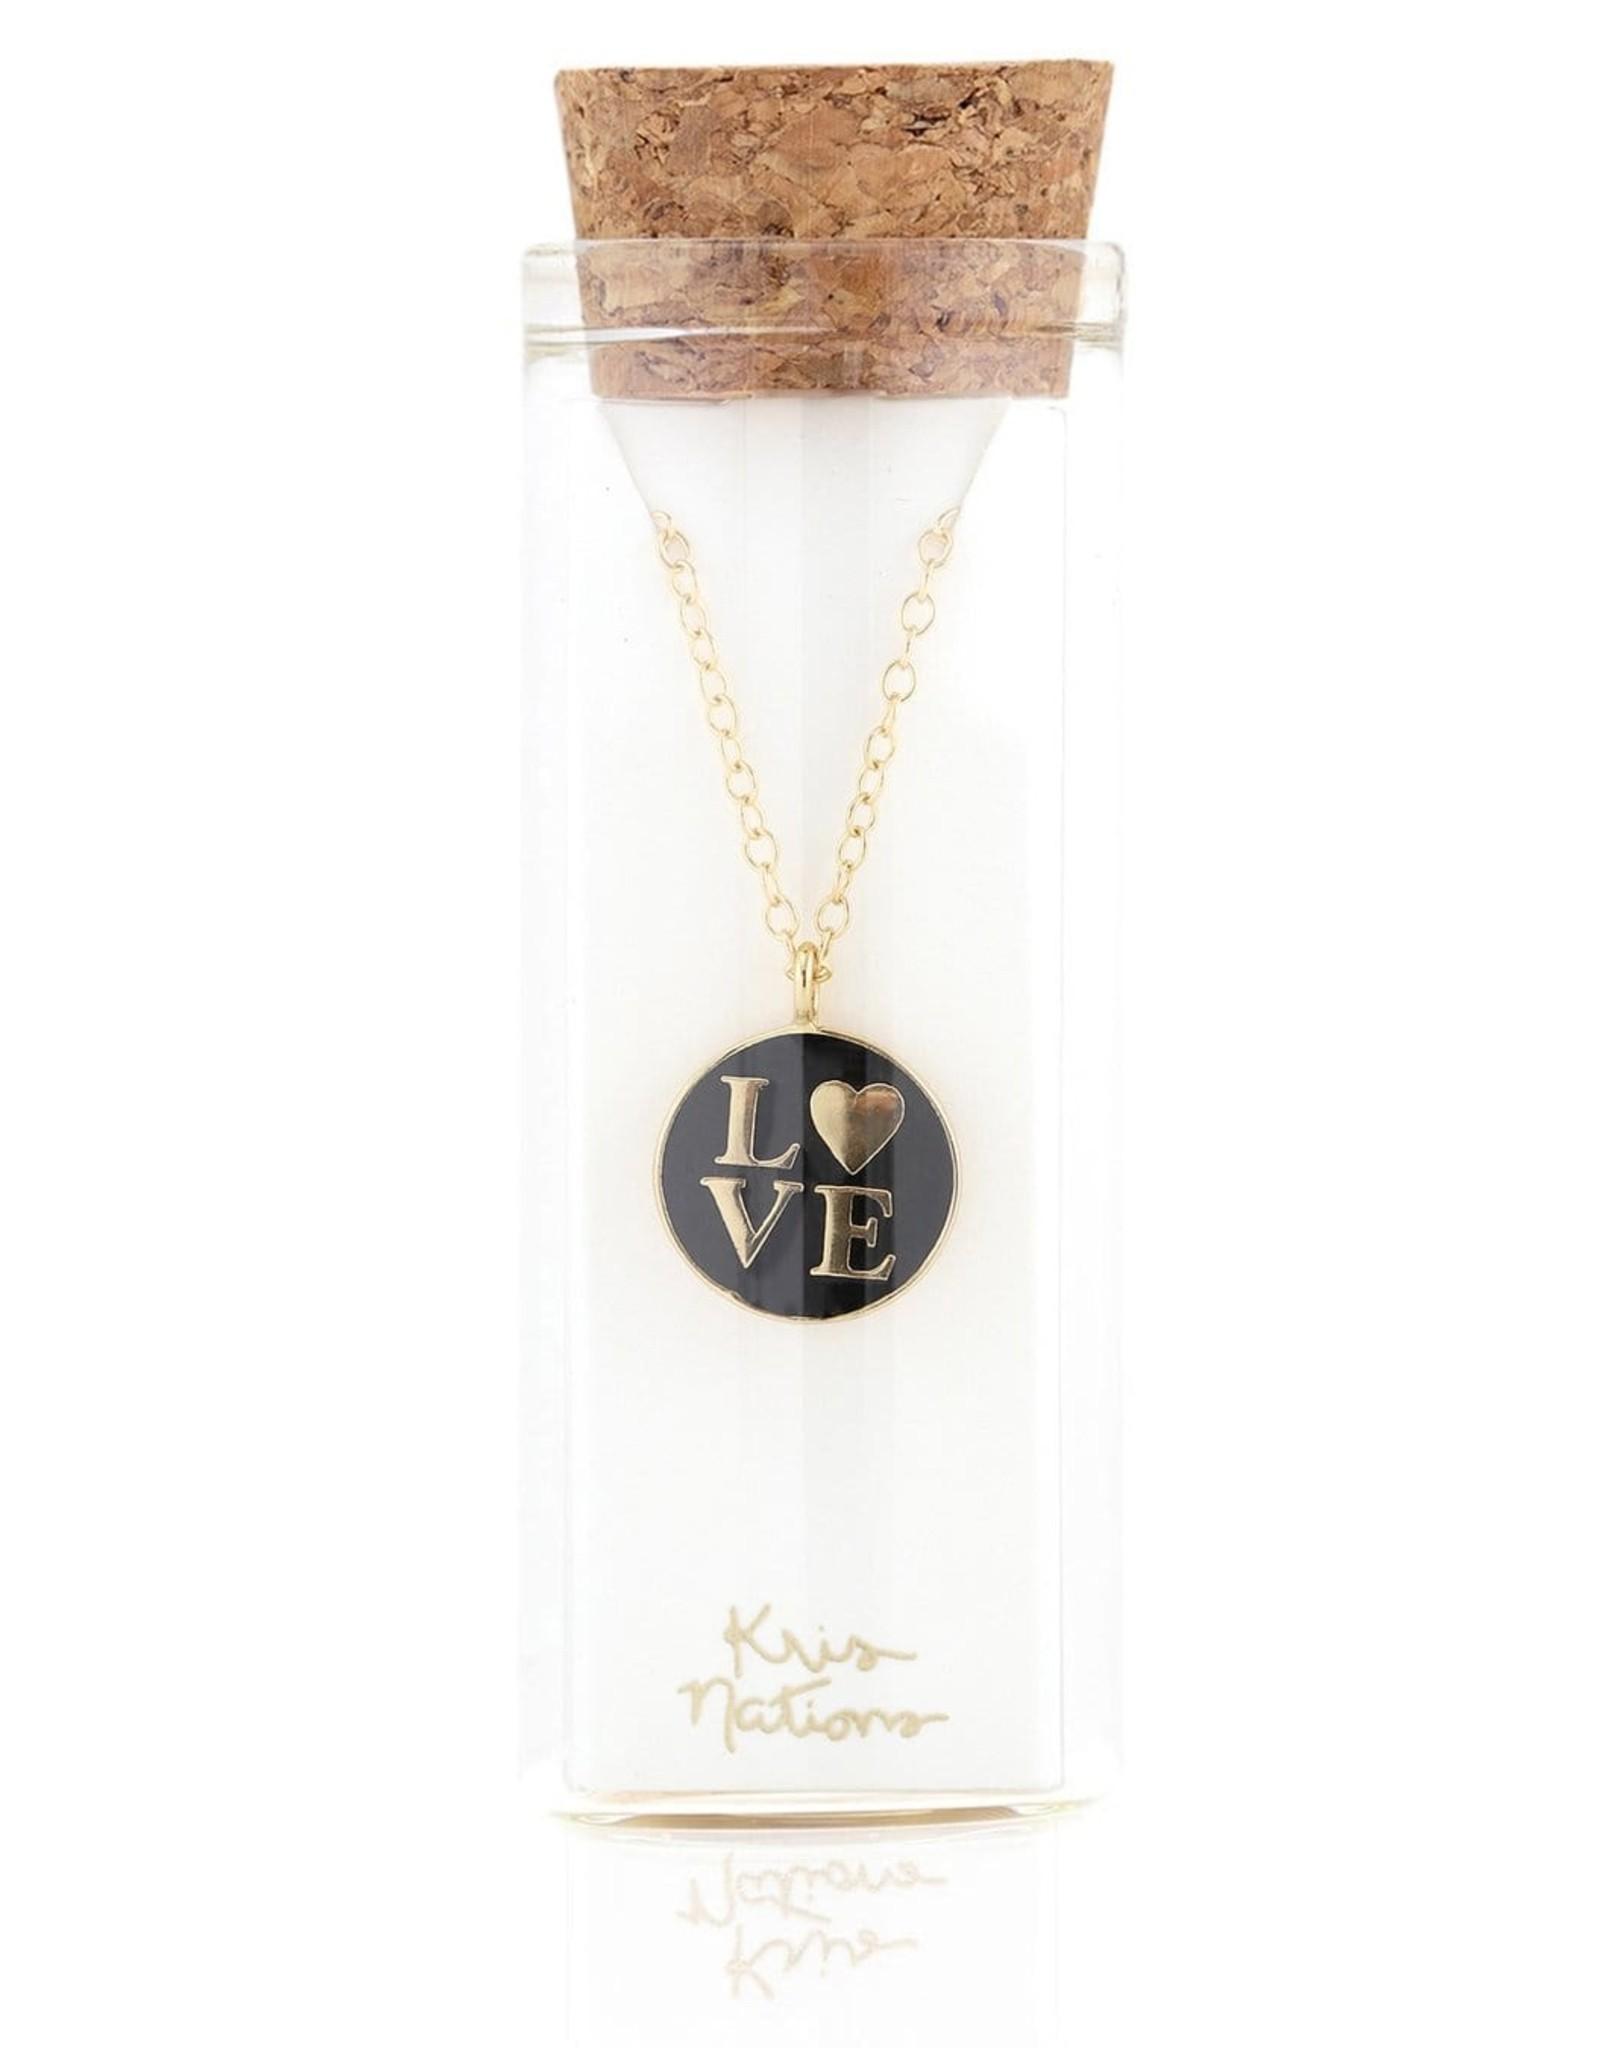 Necklace: Love Enamel charm necklace